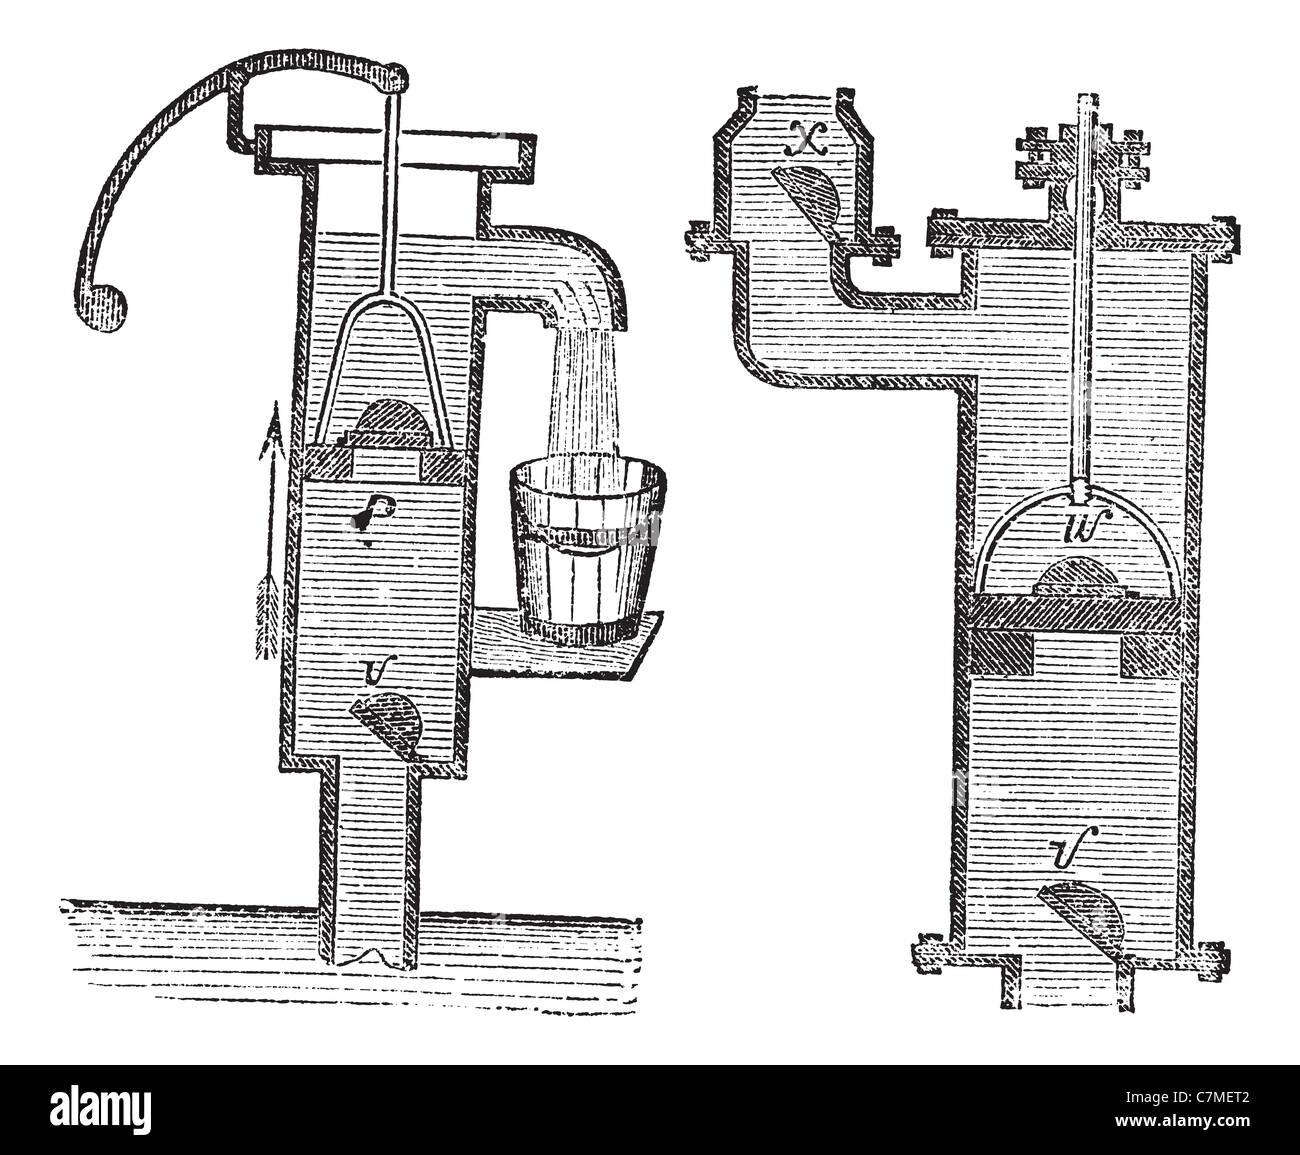 Manuelle Wasserpumpe graviert Vintage Illustration. Trousset Enzyklopädie (1886-1891). Stockbild